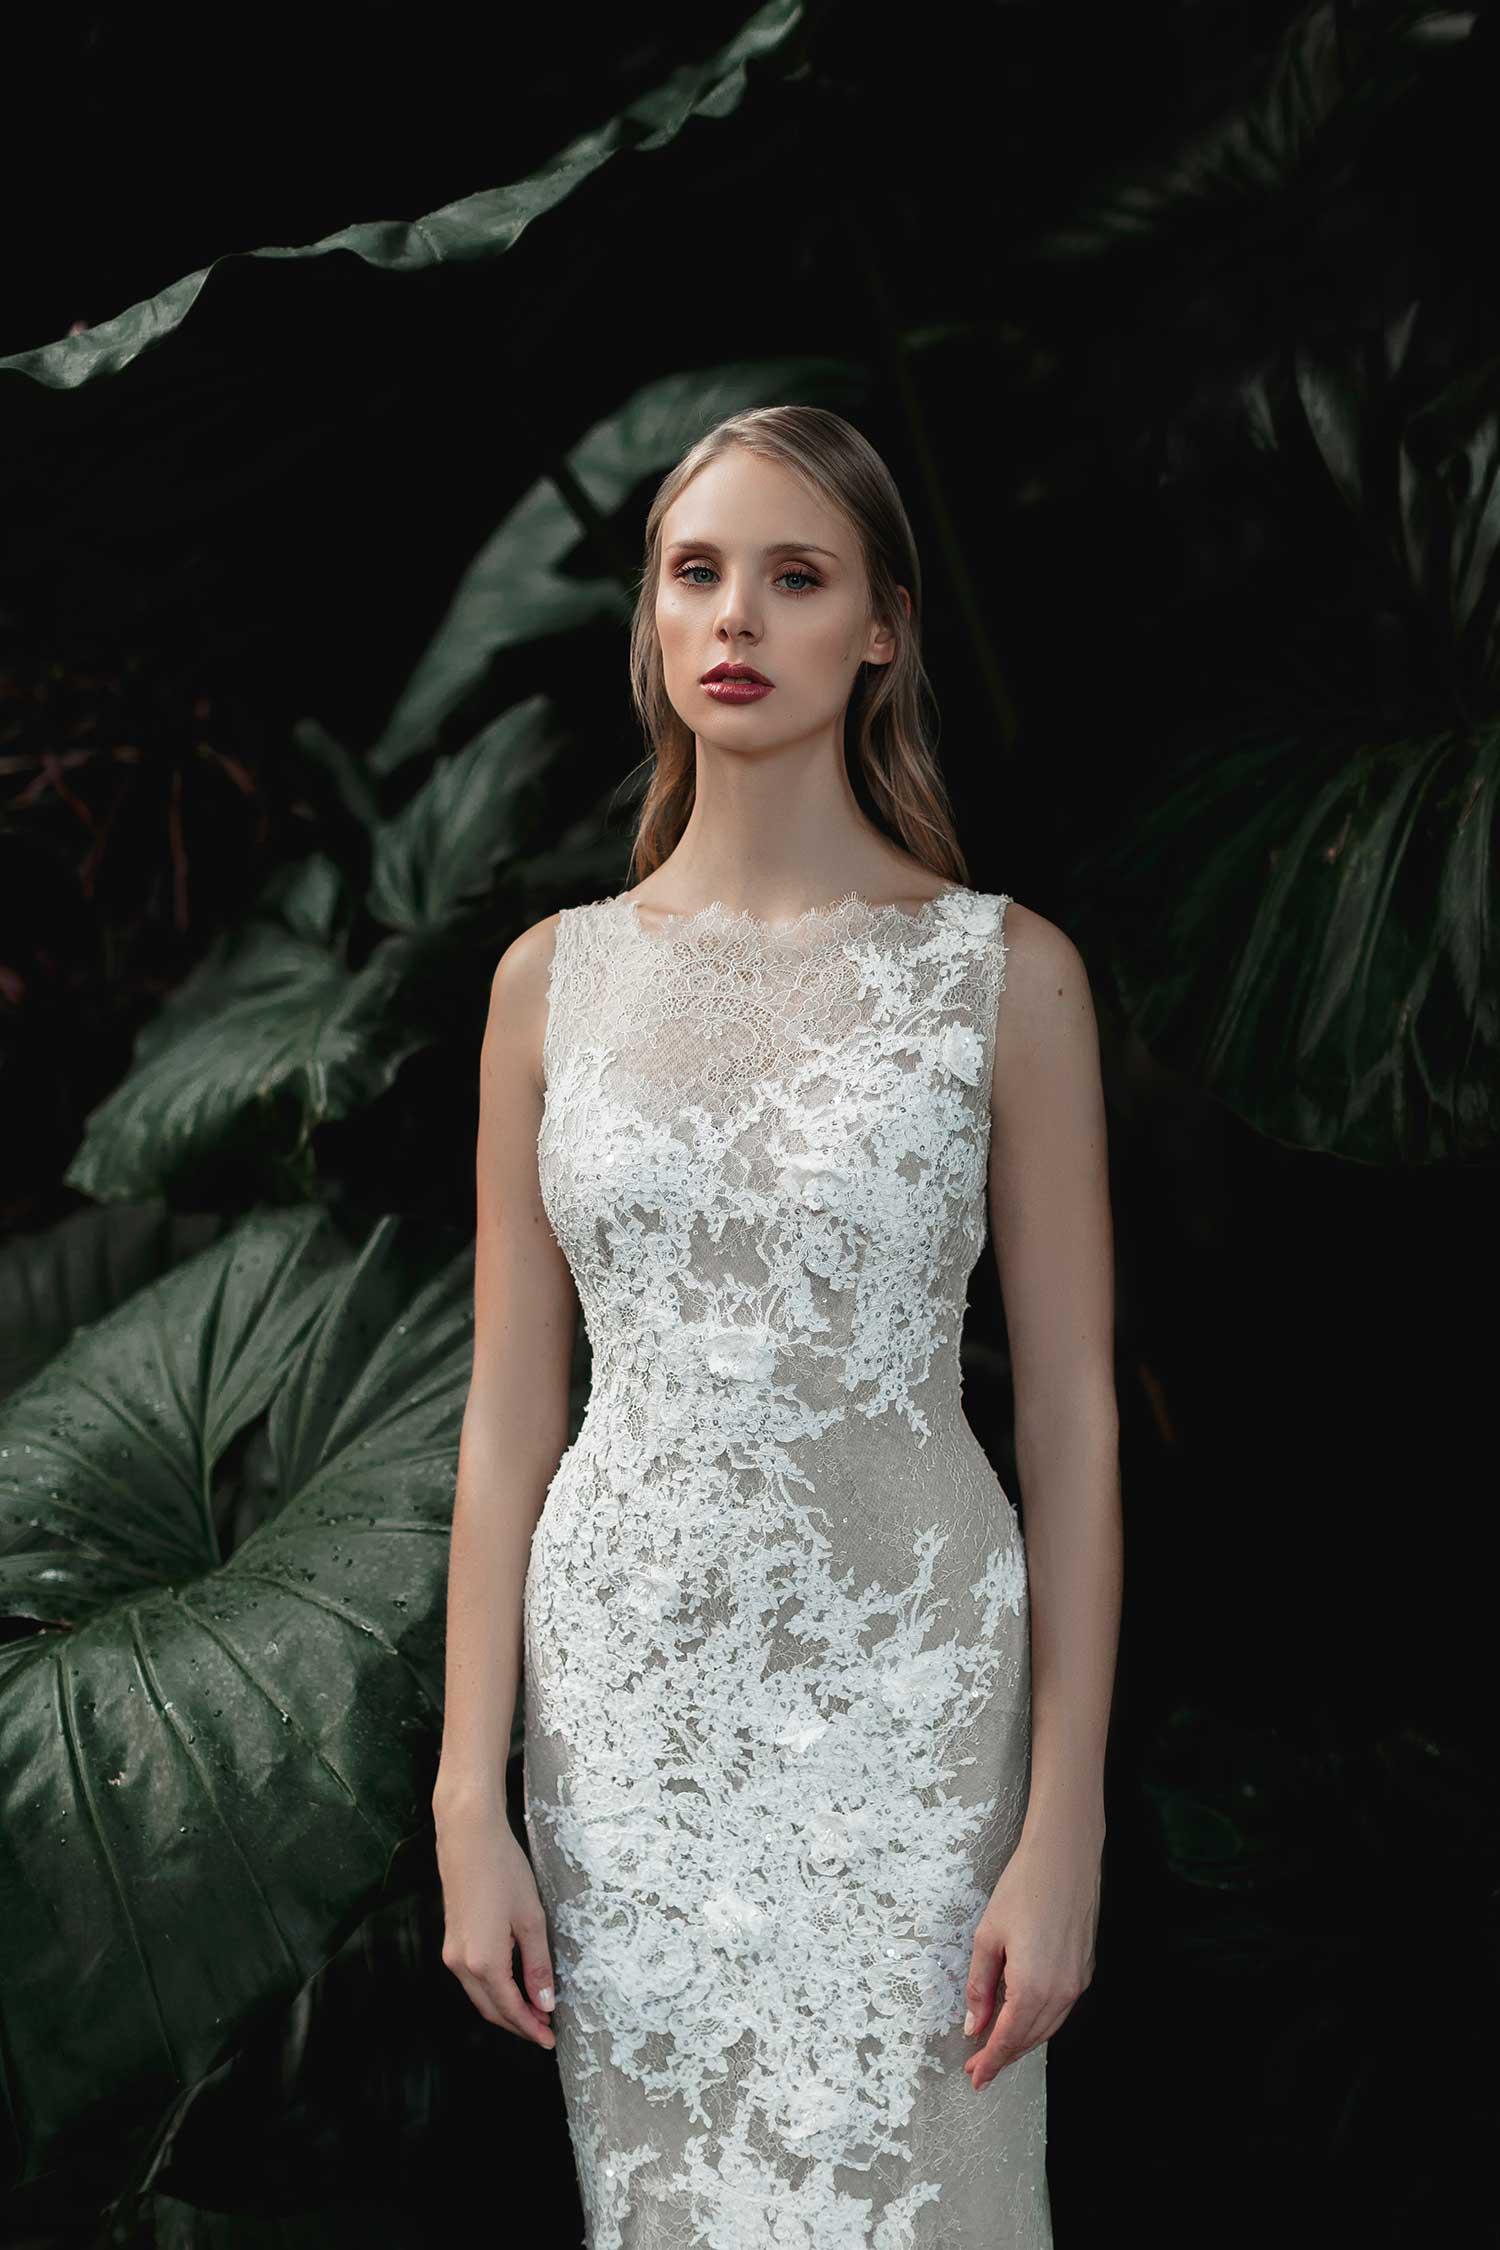 Elegant bridal photoshoot